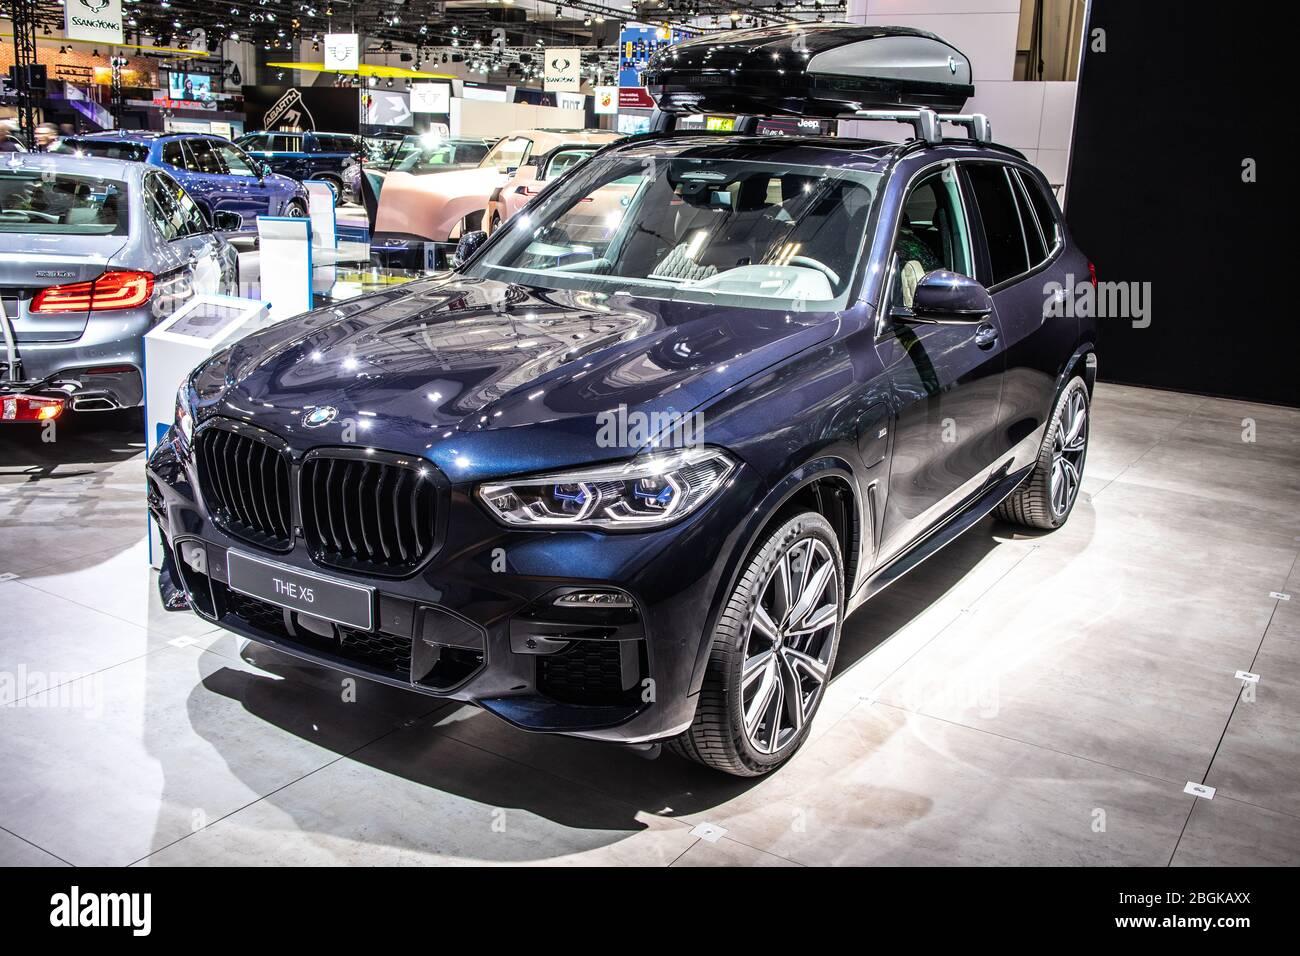 2020 Next Gen BMW X5 Suv Reviews